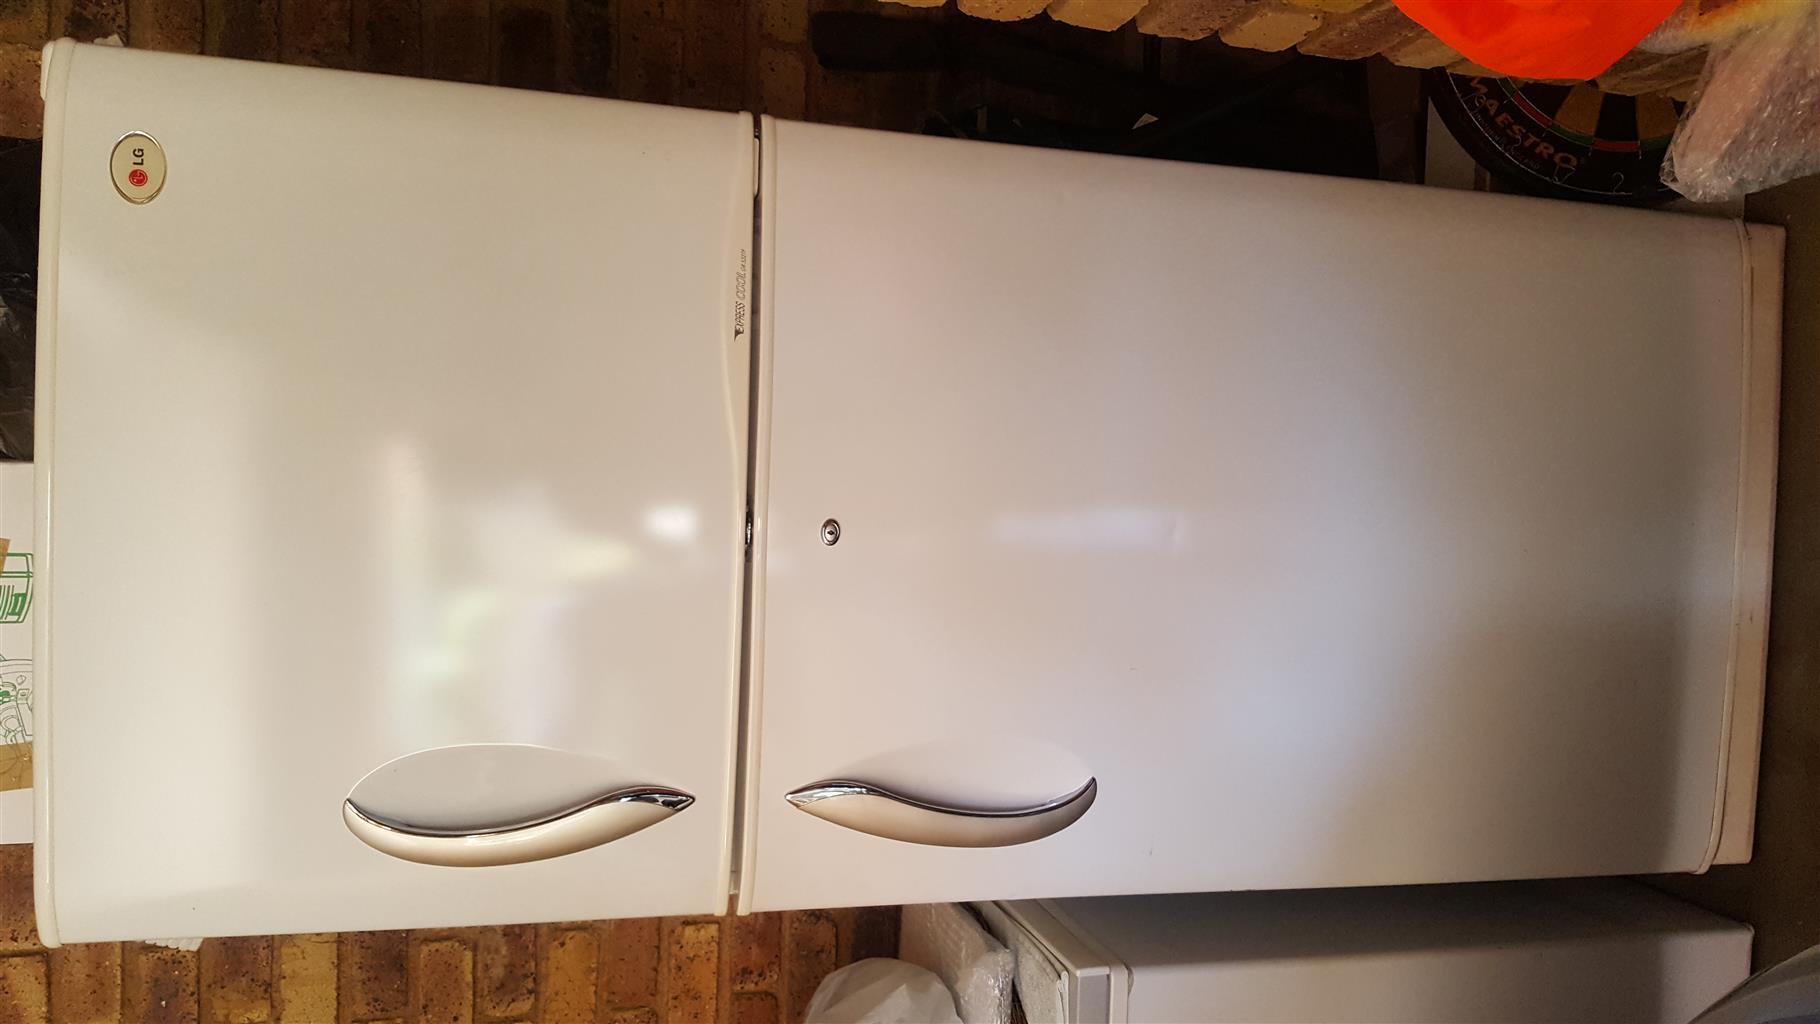 Almost brand new LG white fridge/freezer for sale